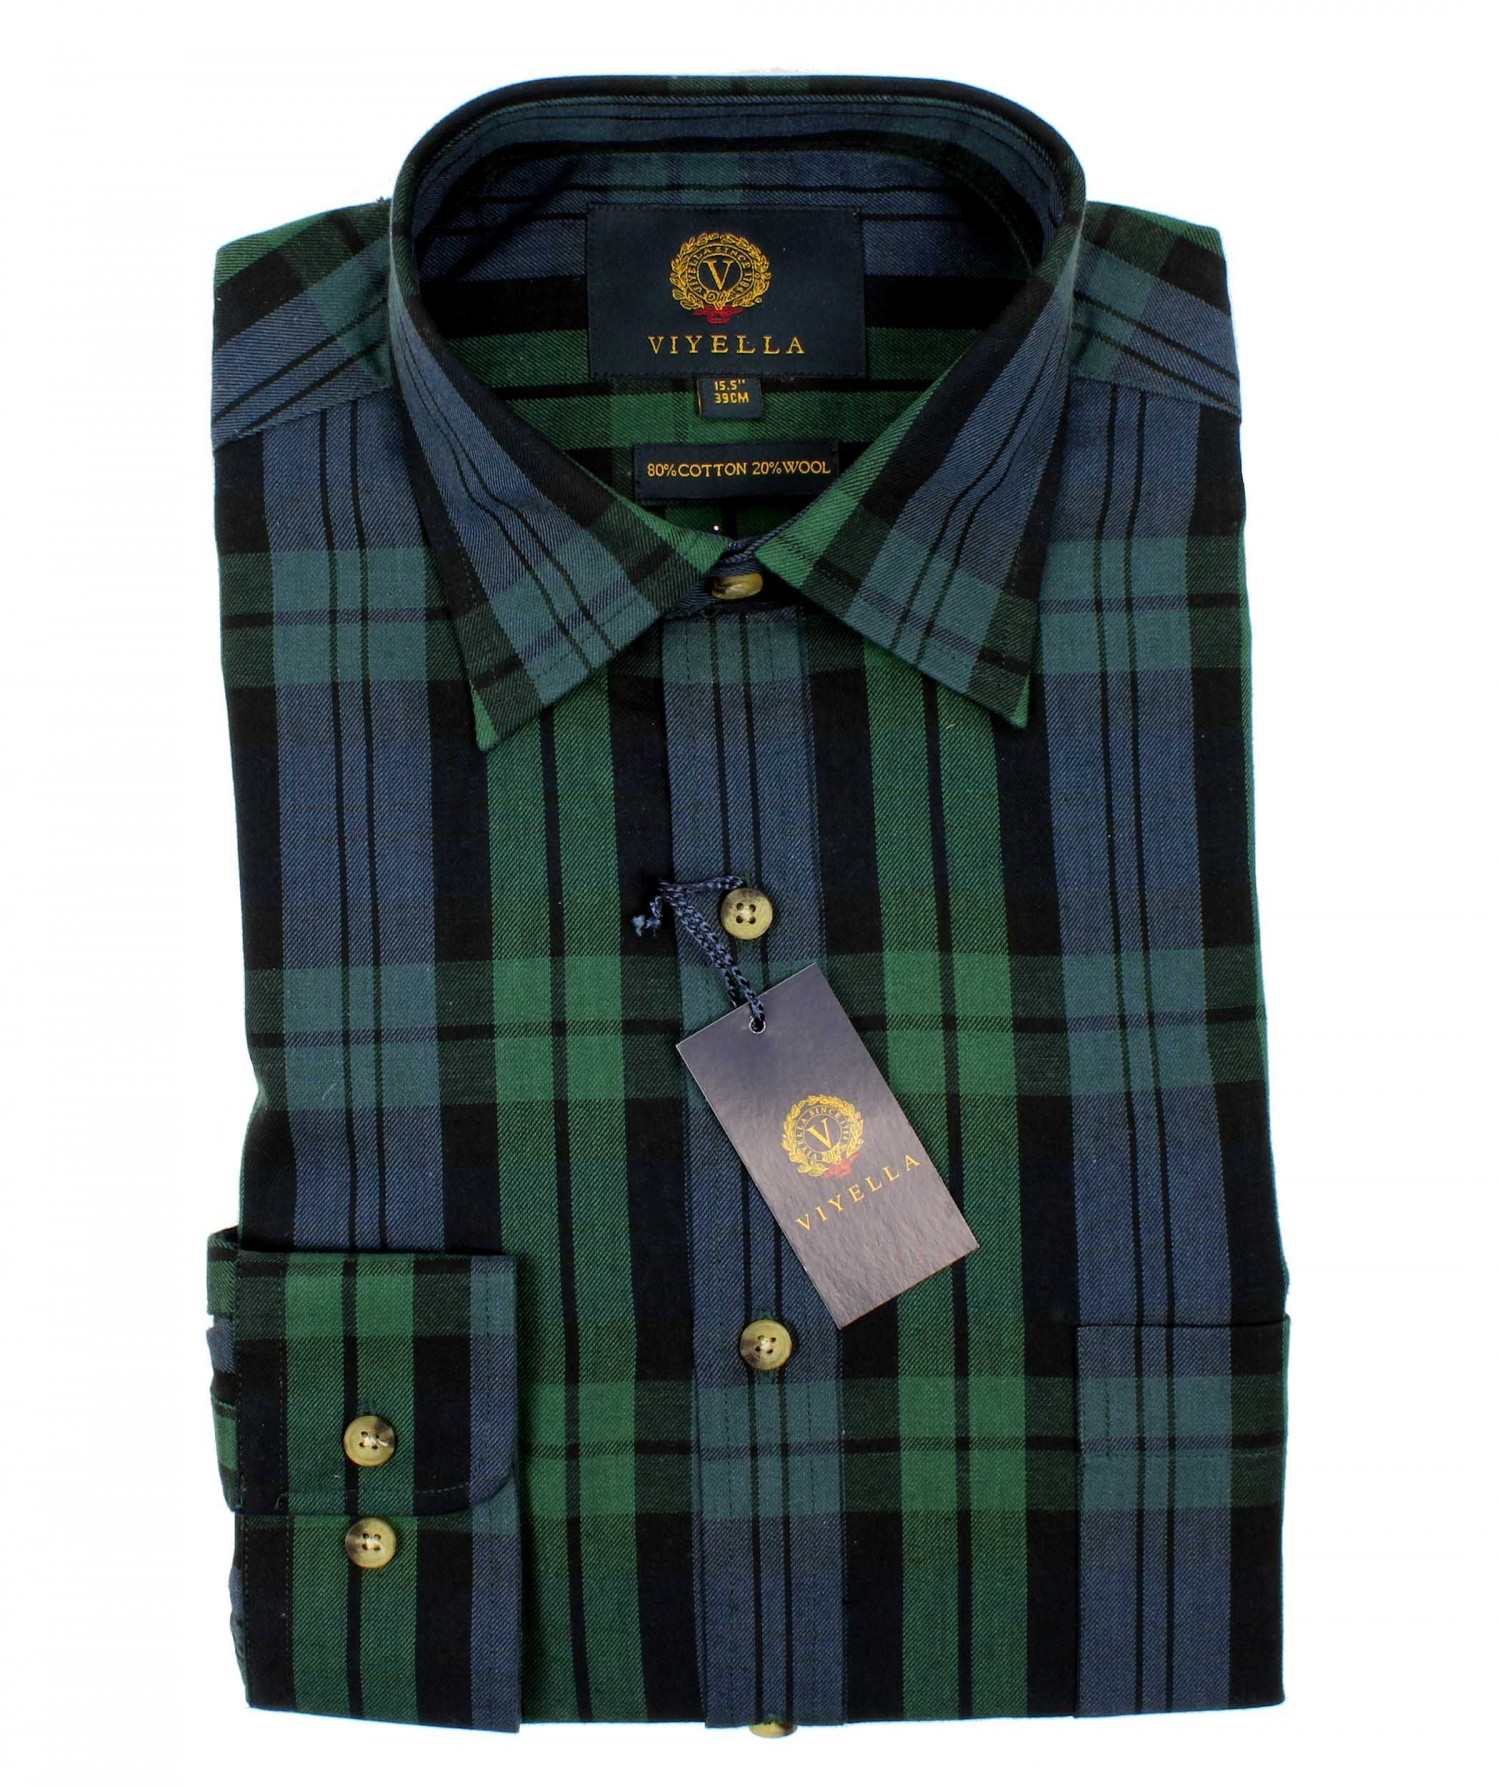 b0871274a0 Viyella Black Watch Tartan 80 20 Cotton Wool Blend Shirt